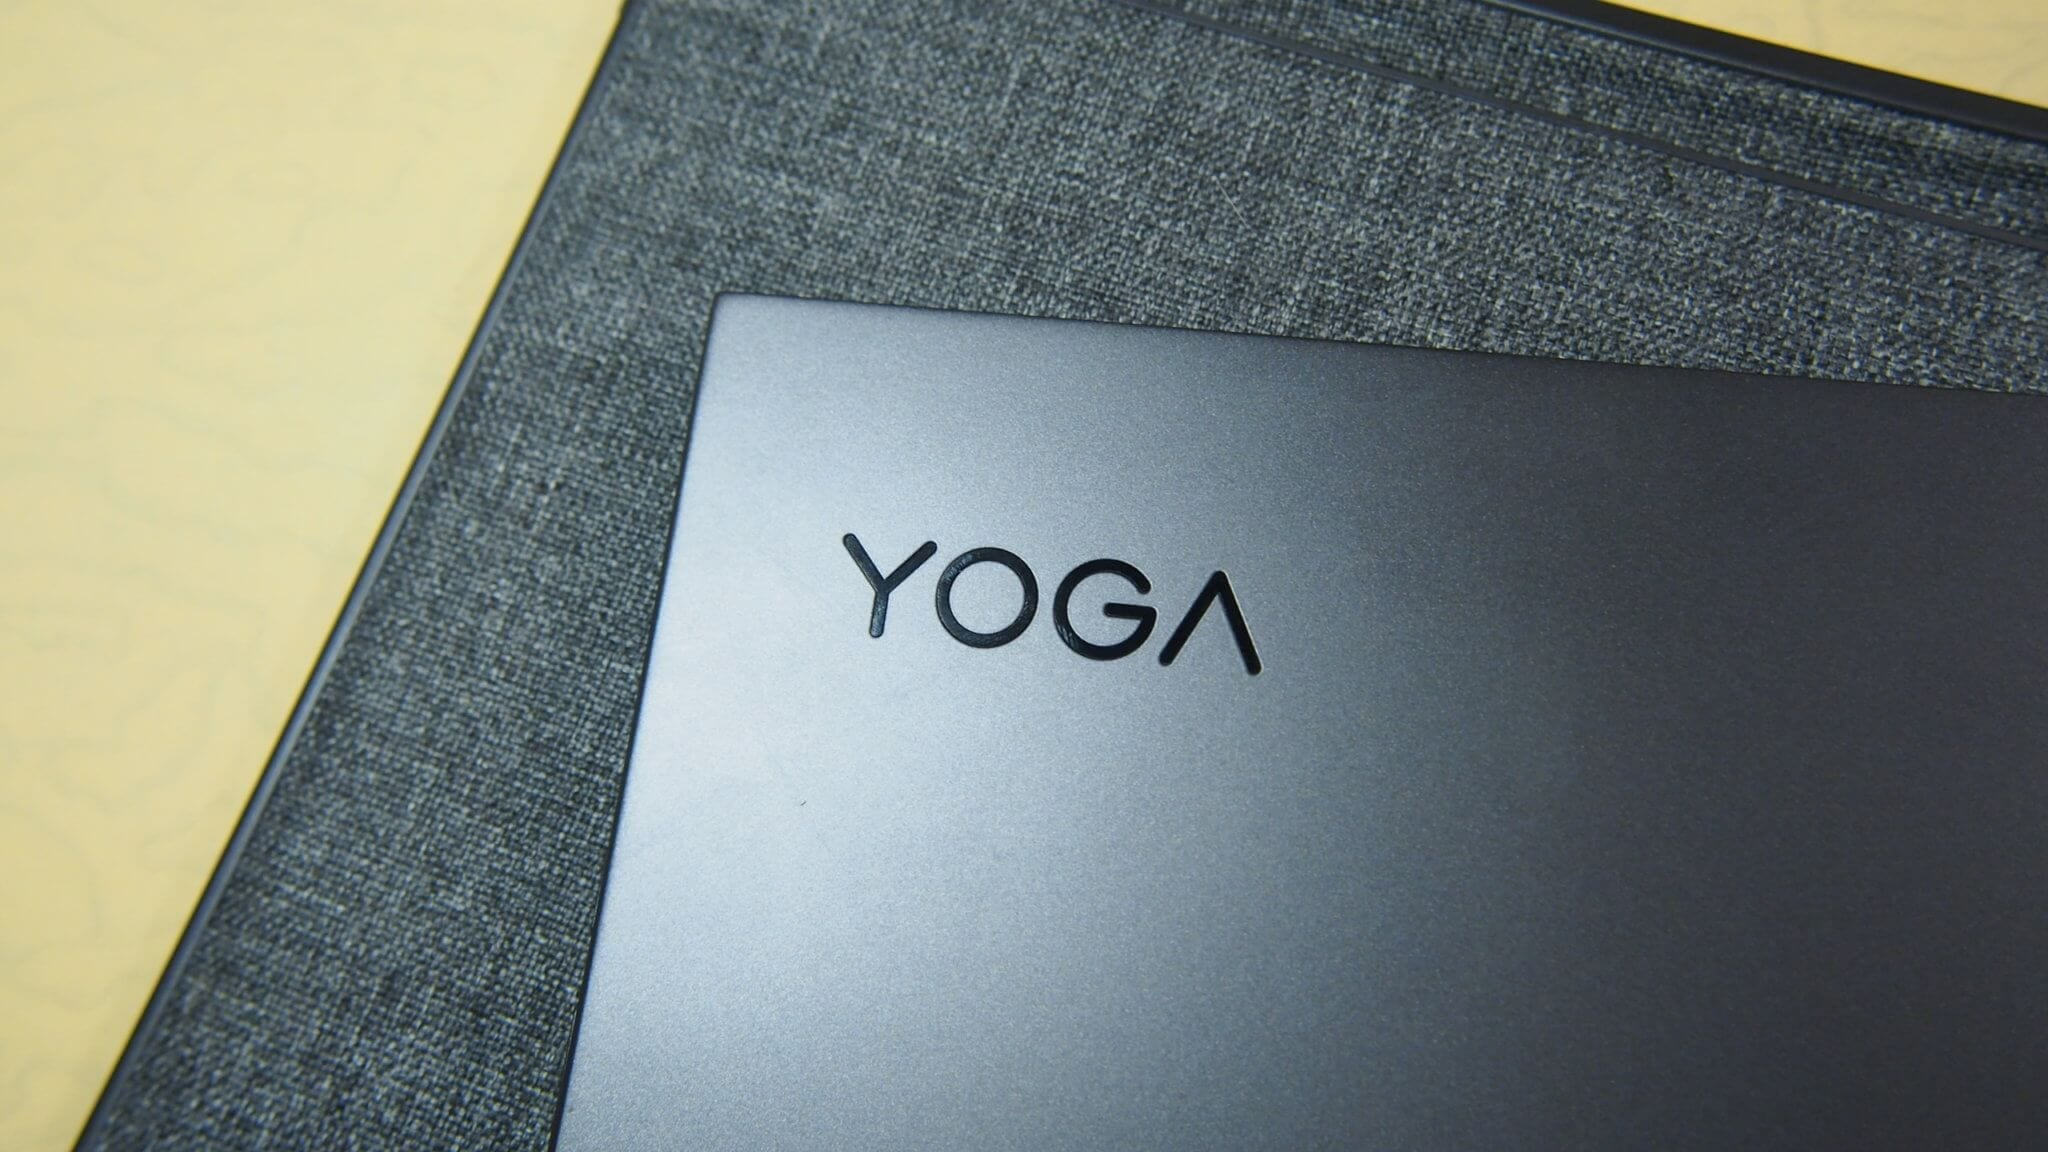 Yoga Duet 7